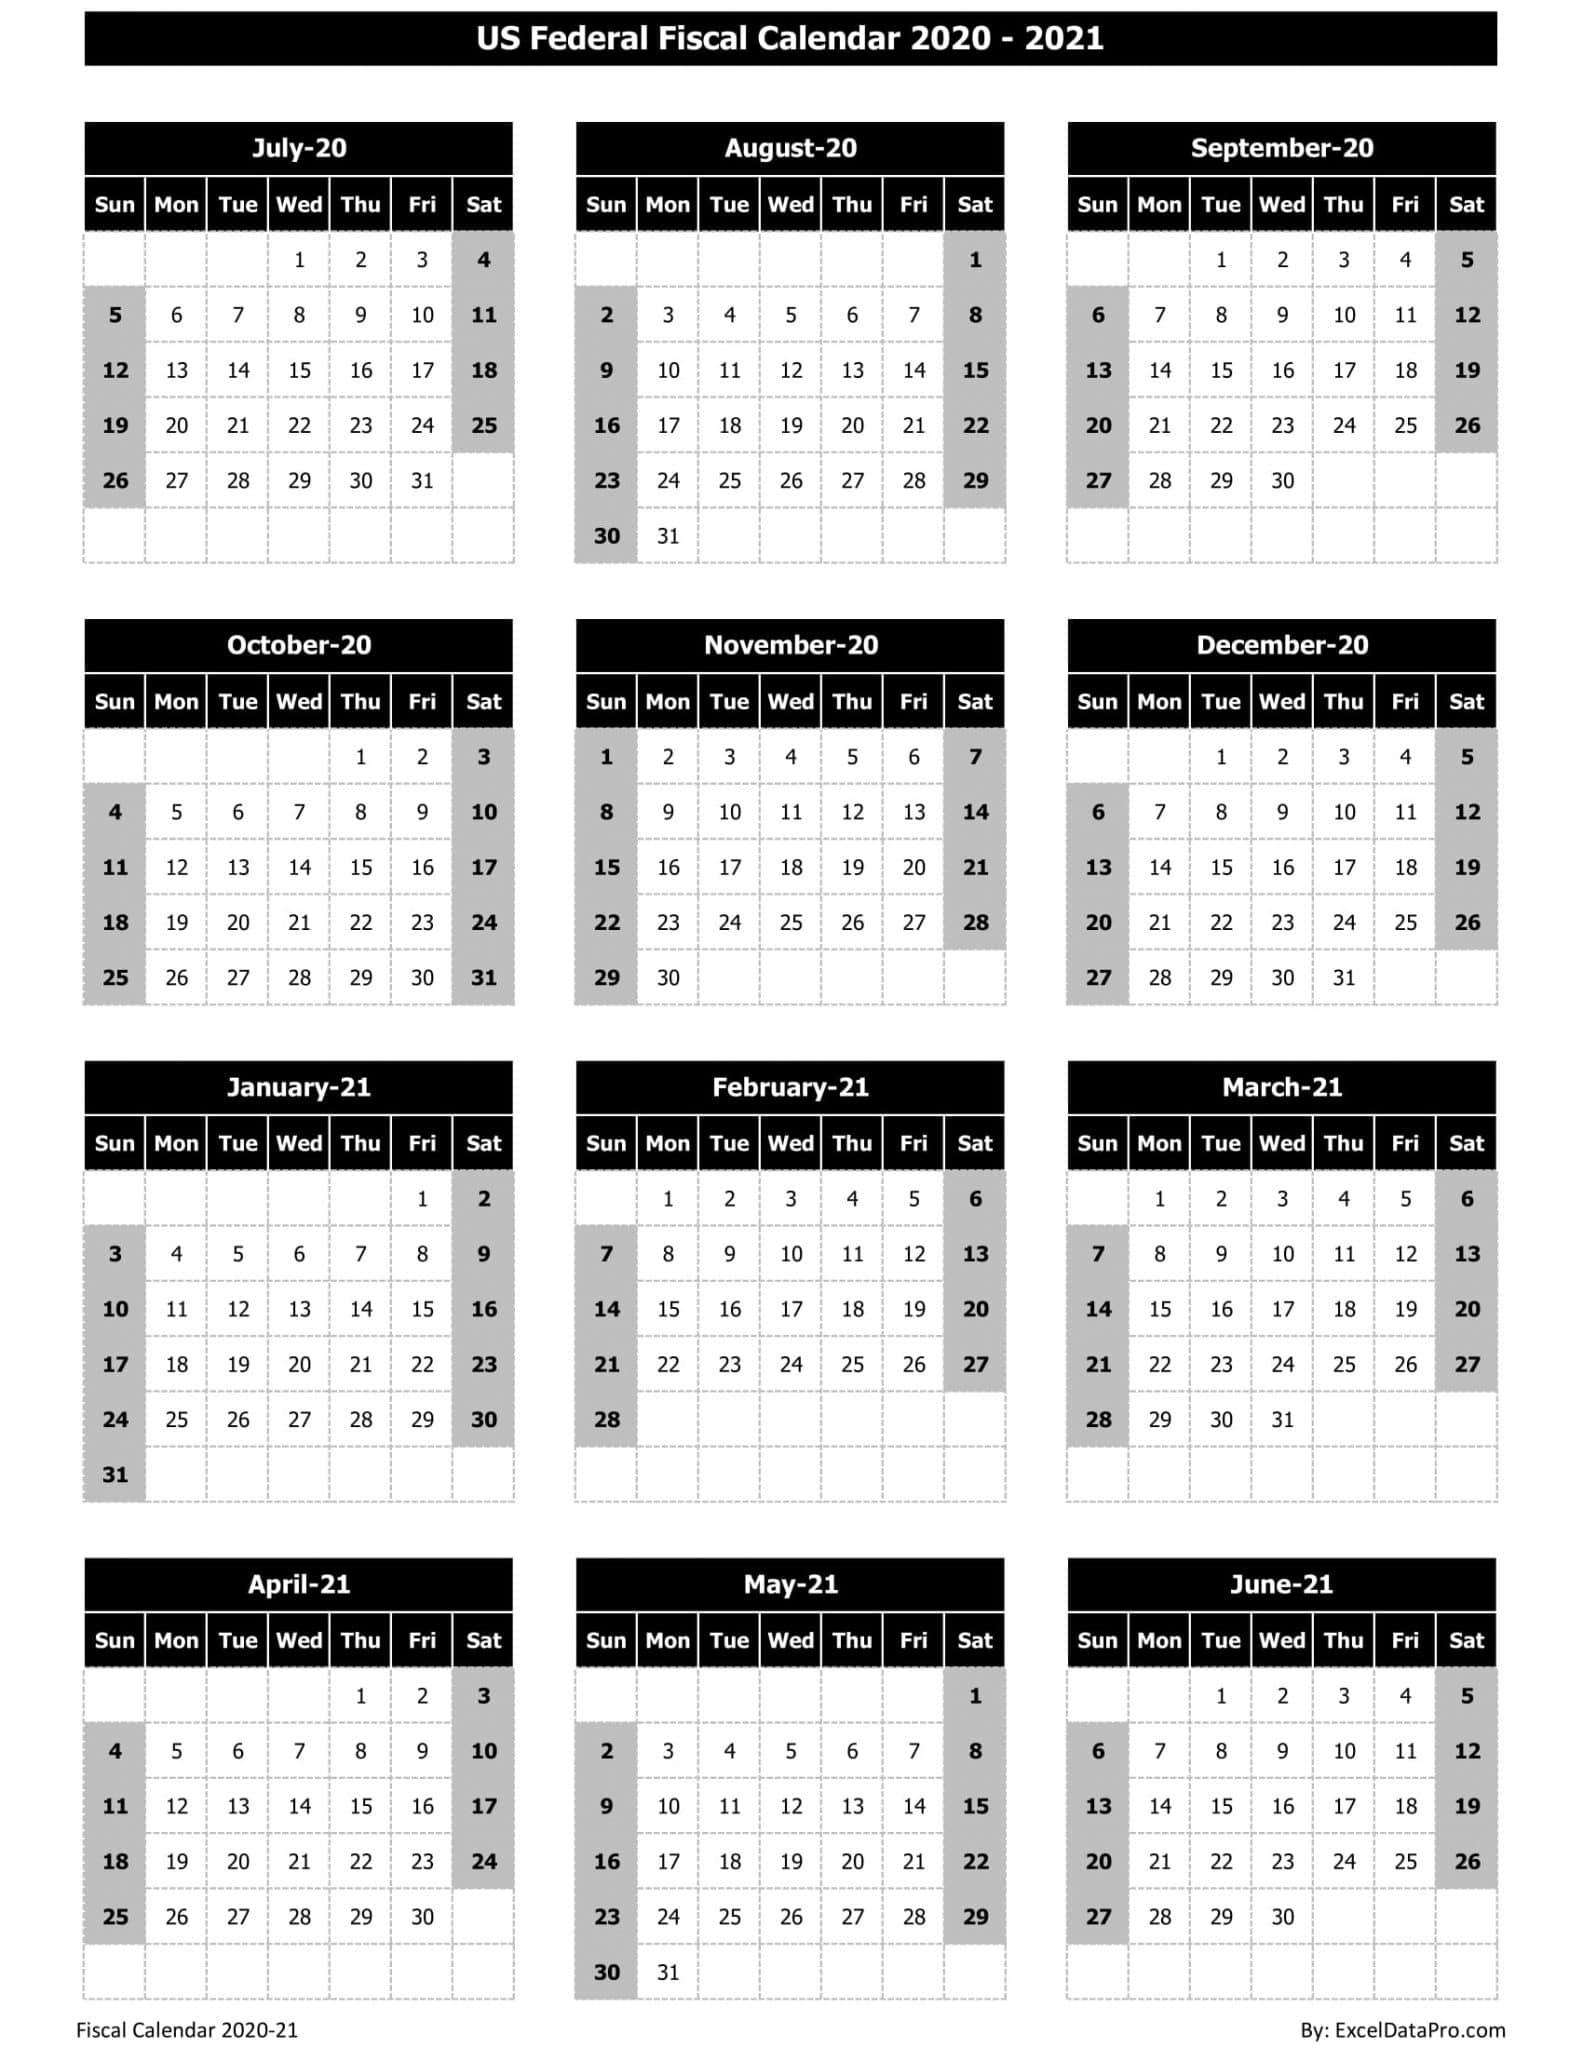 US Federal Fiscal Calendar 2020-21 - Black & White